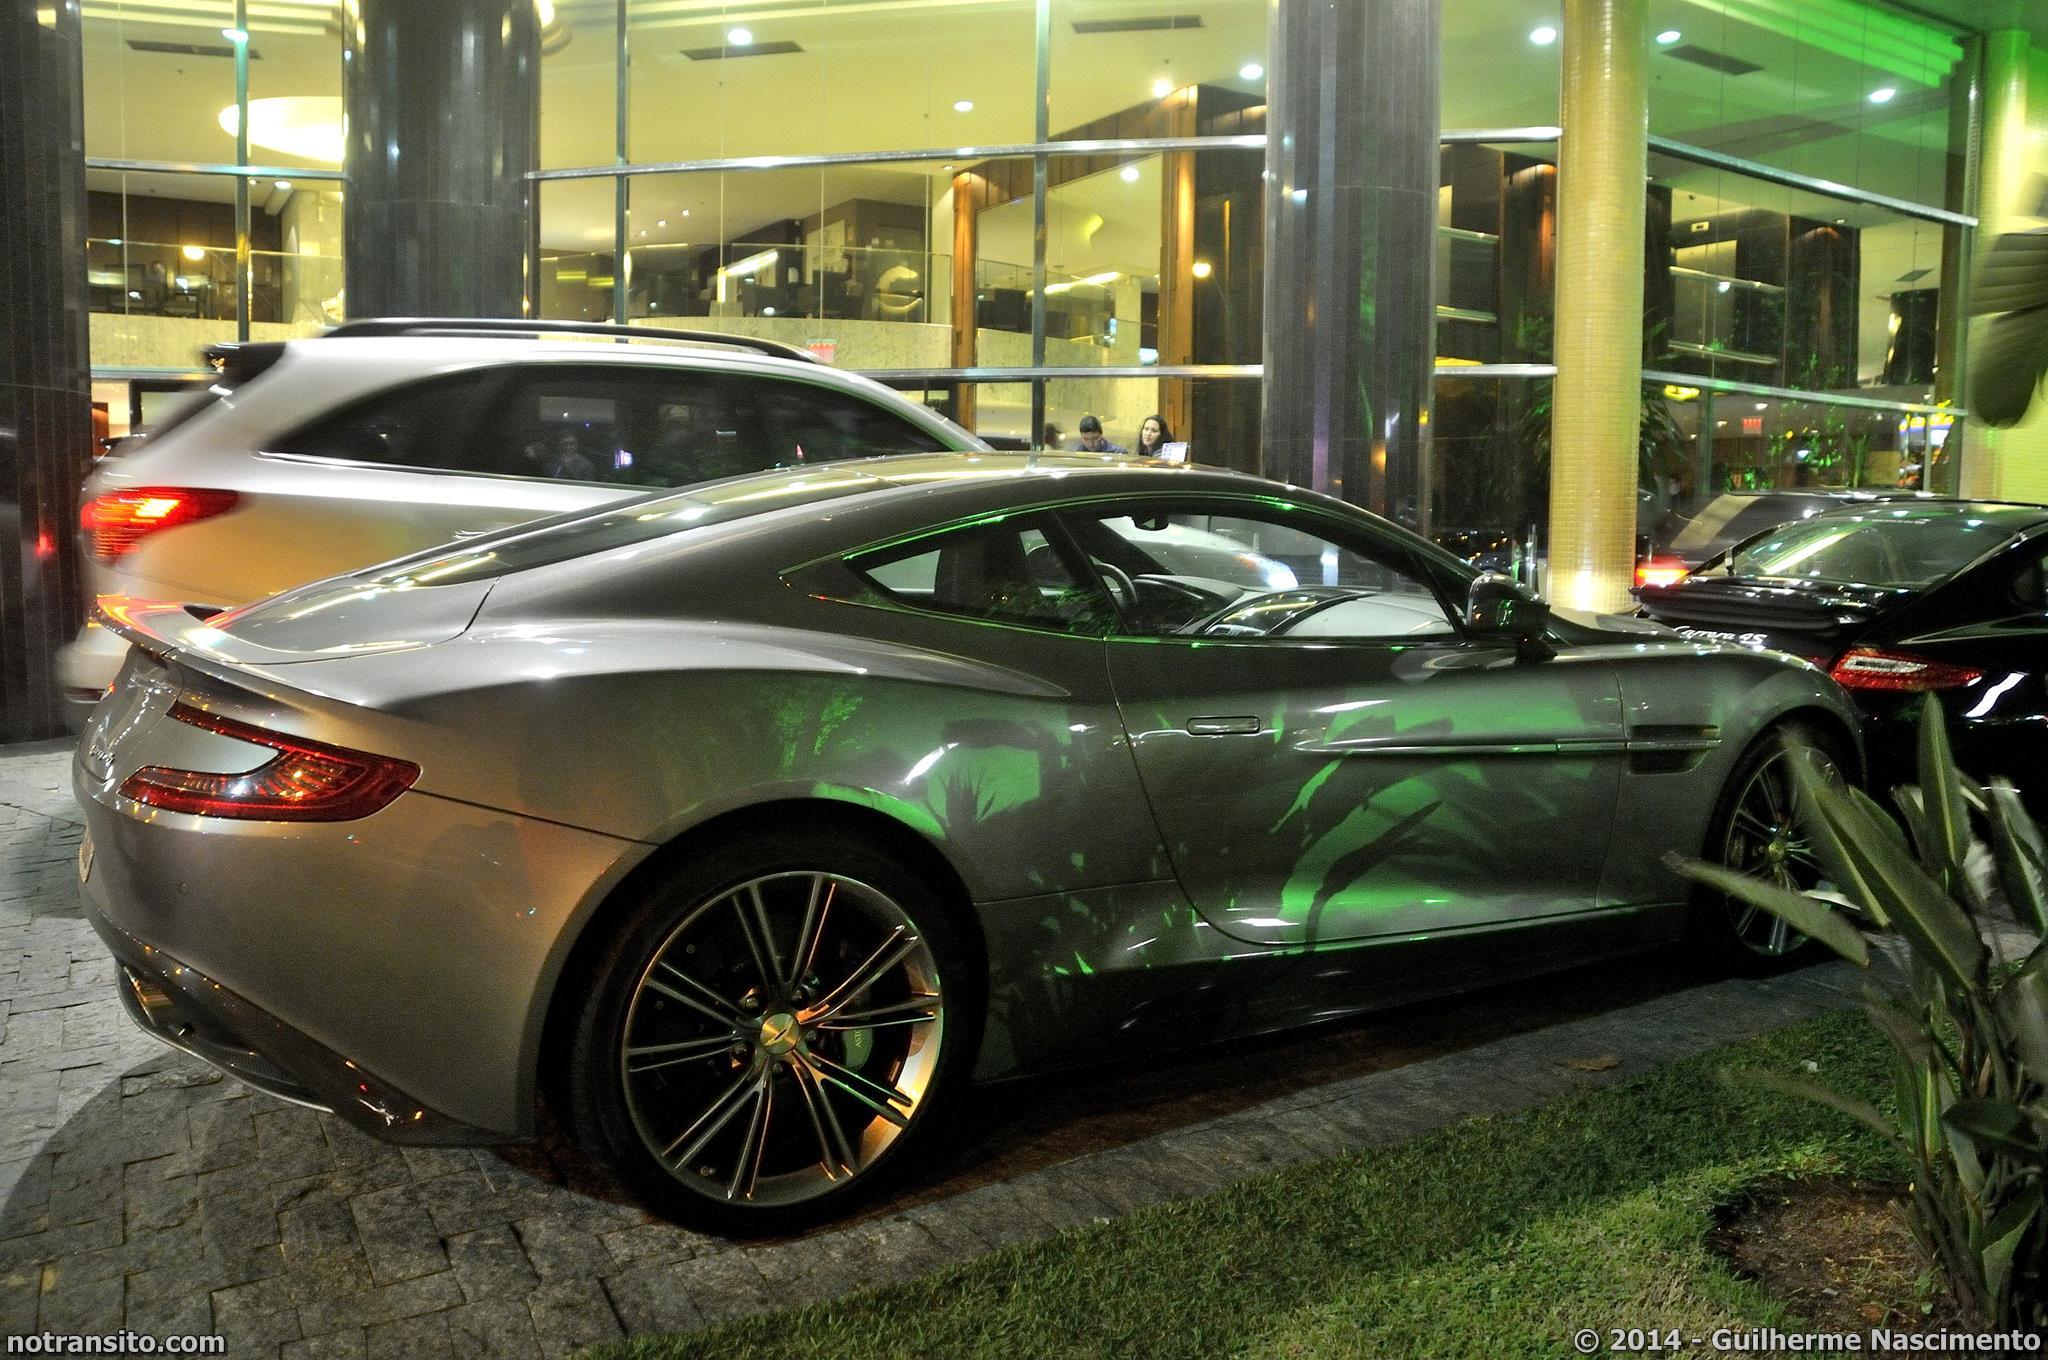 Aston Martin Vanquish, Second Generation Vanquish, Tungsten Silver, Majestic Hotel Florianópolis